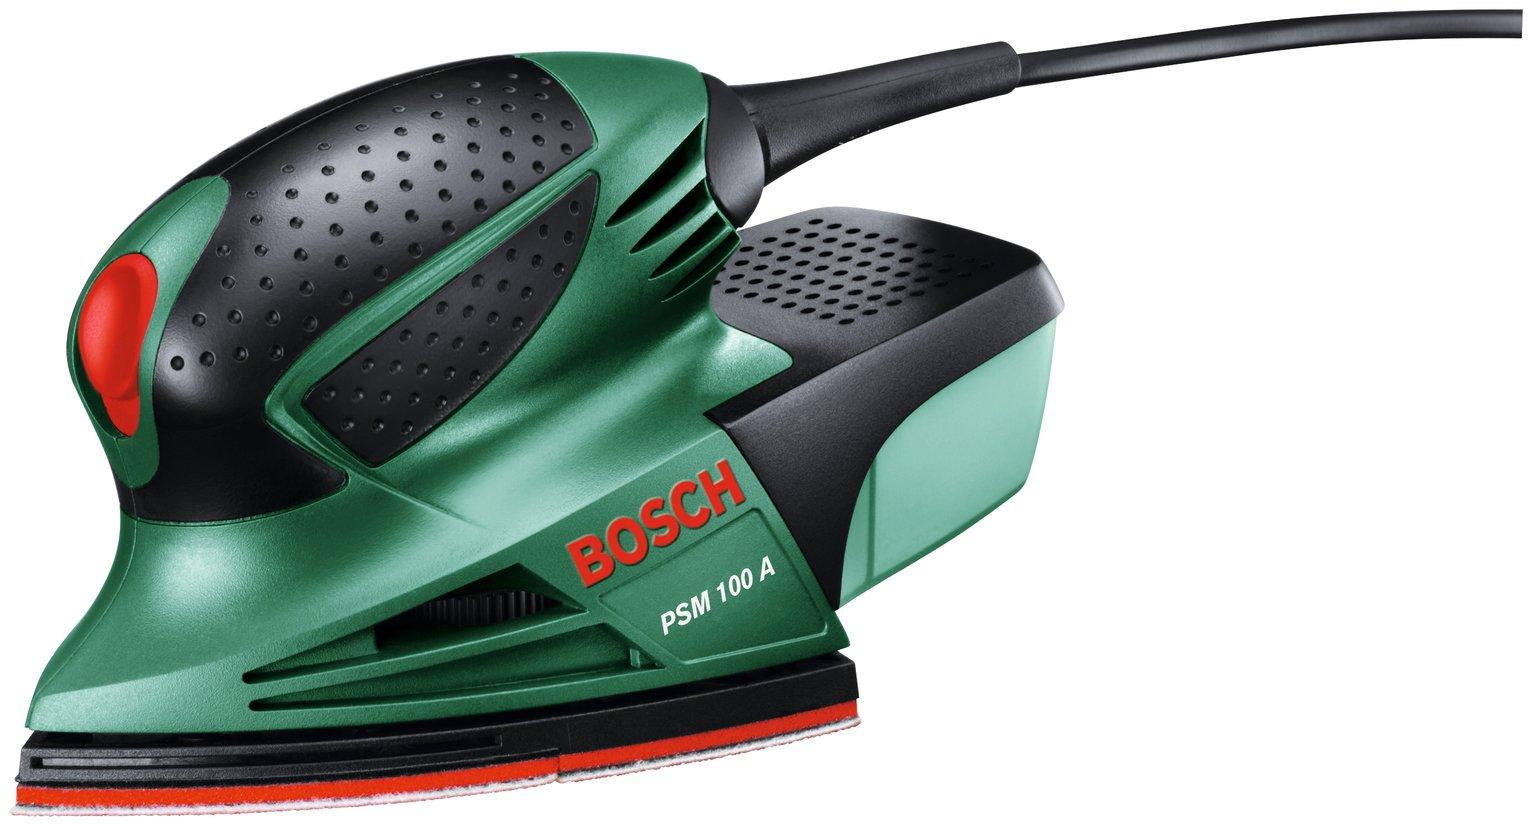 Bosch PSM 100A Sander